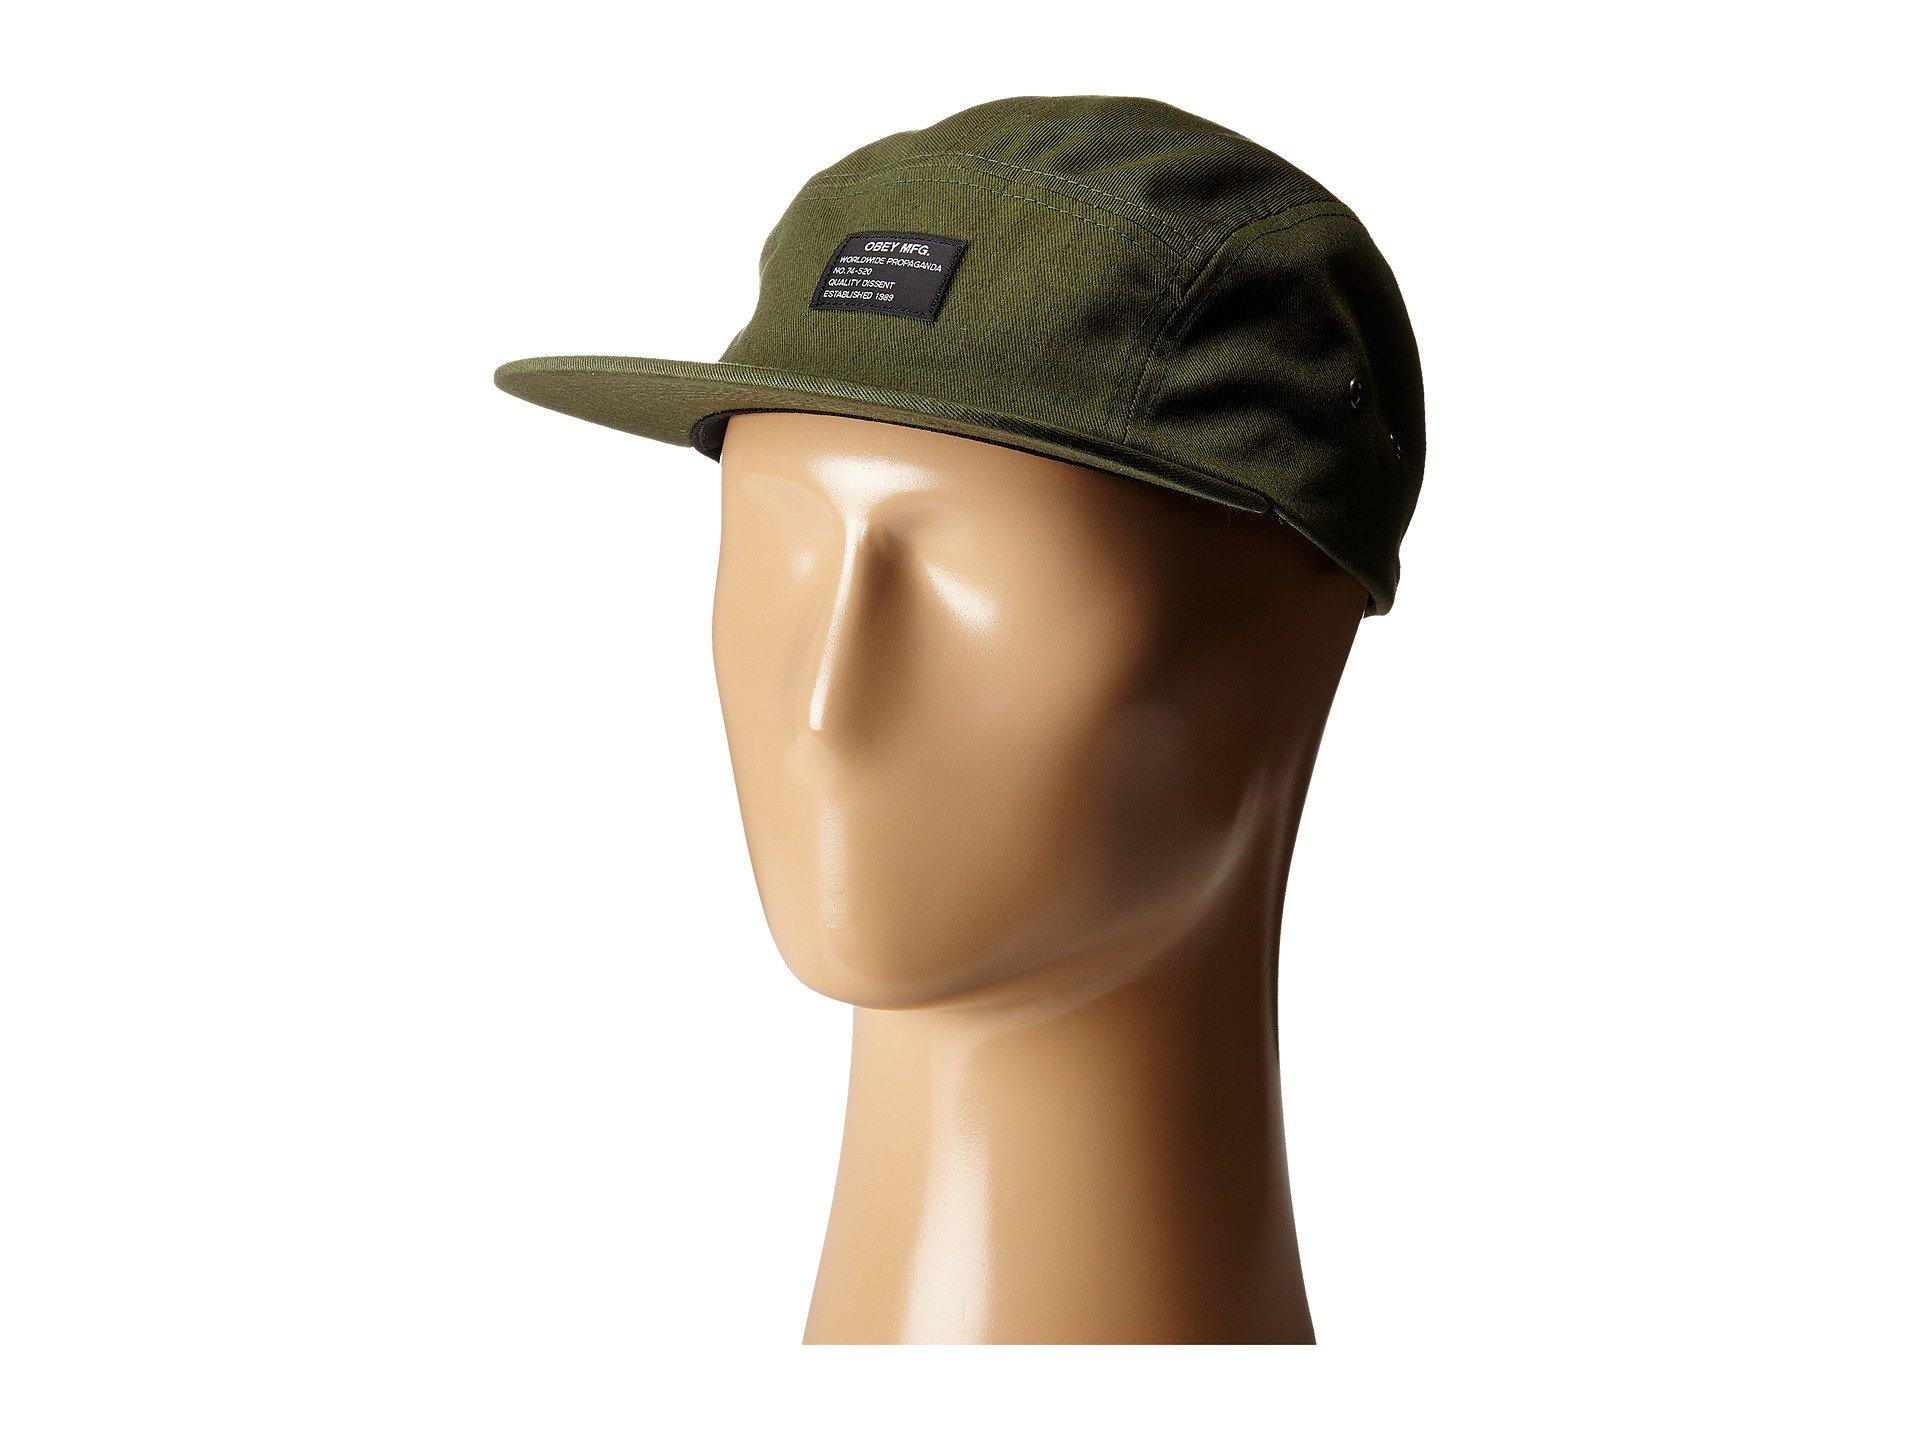 28d70c43d89 Lyst - Obey Platoon 5 Panel Cap in Green for Men